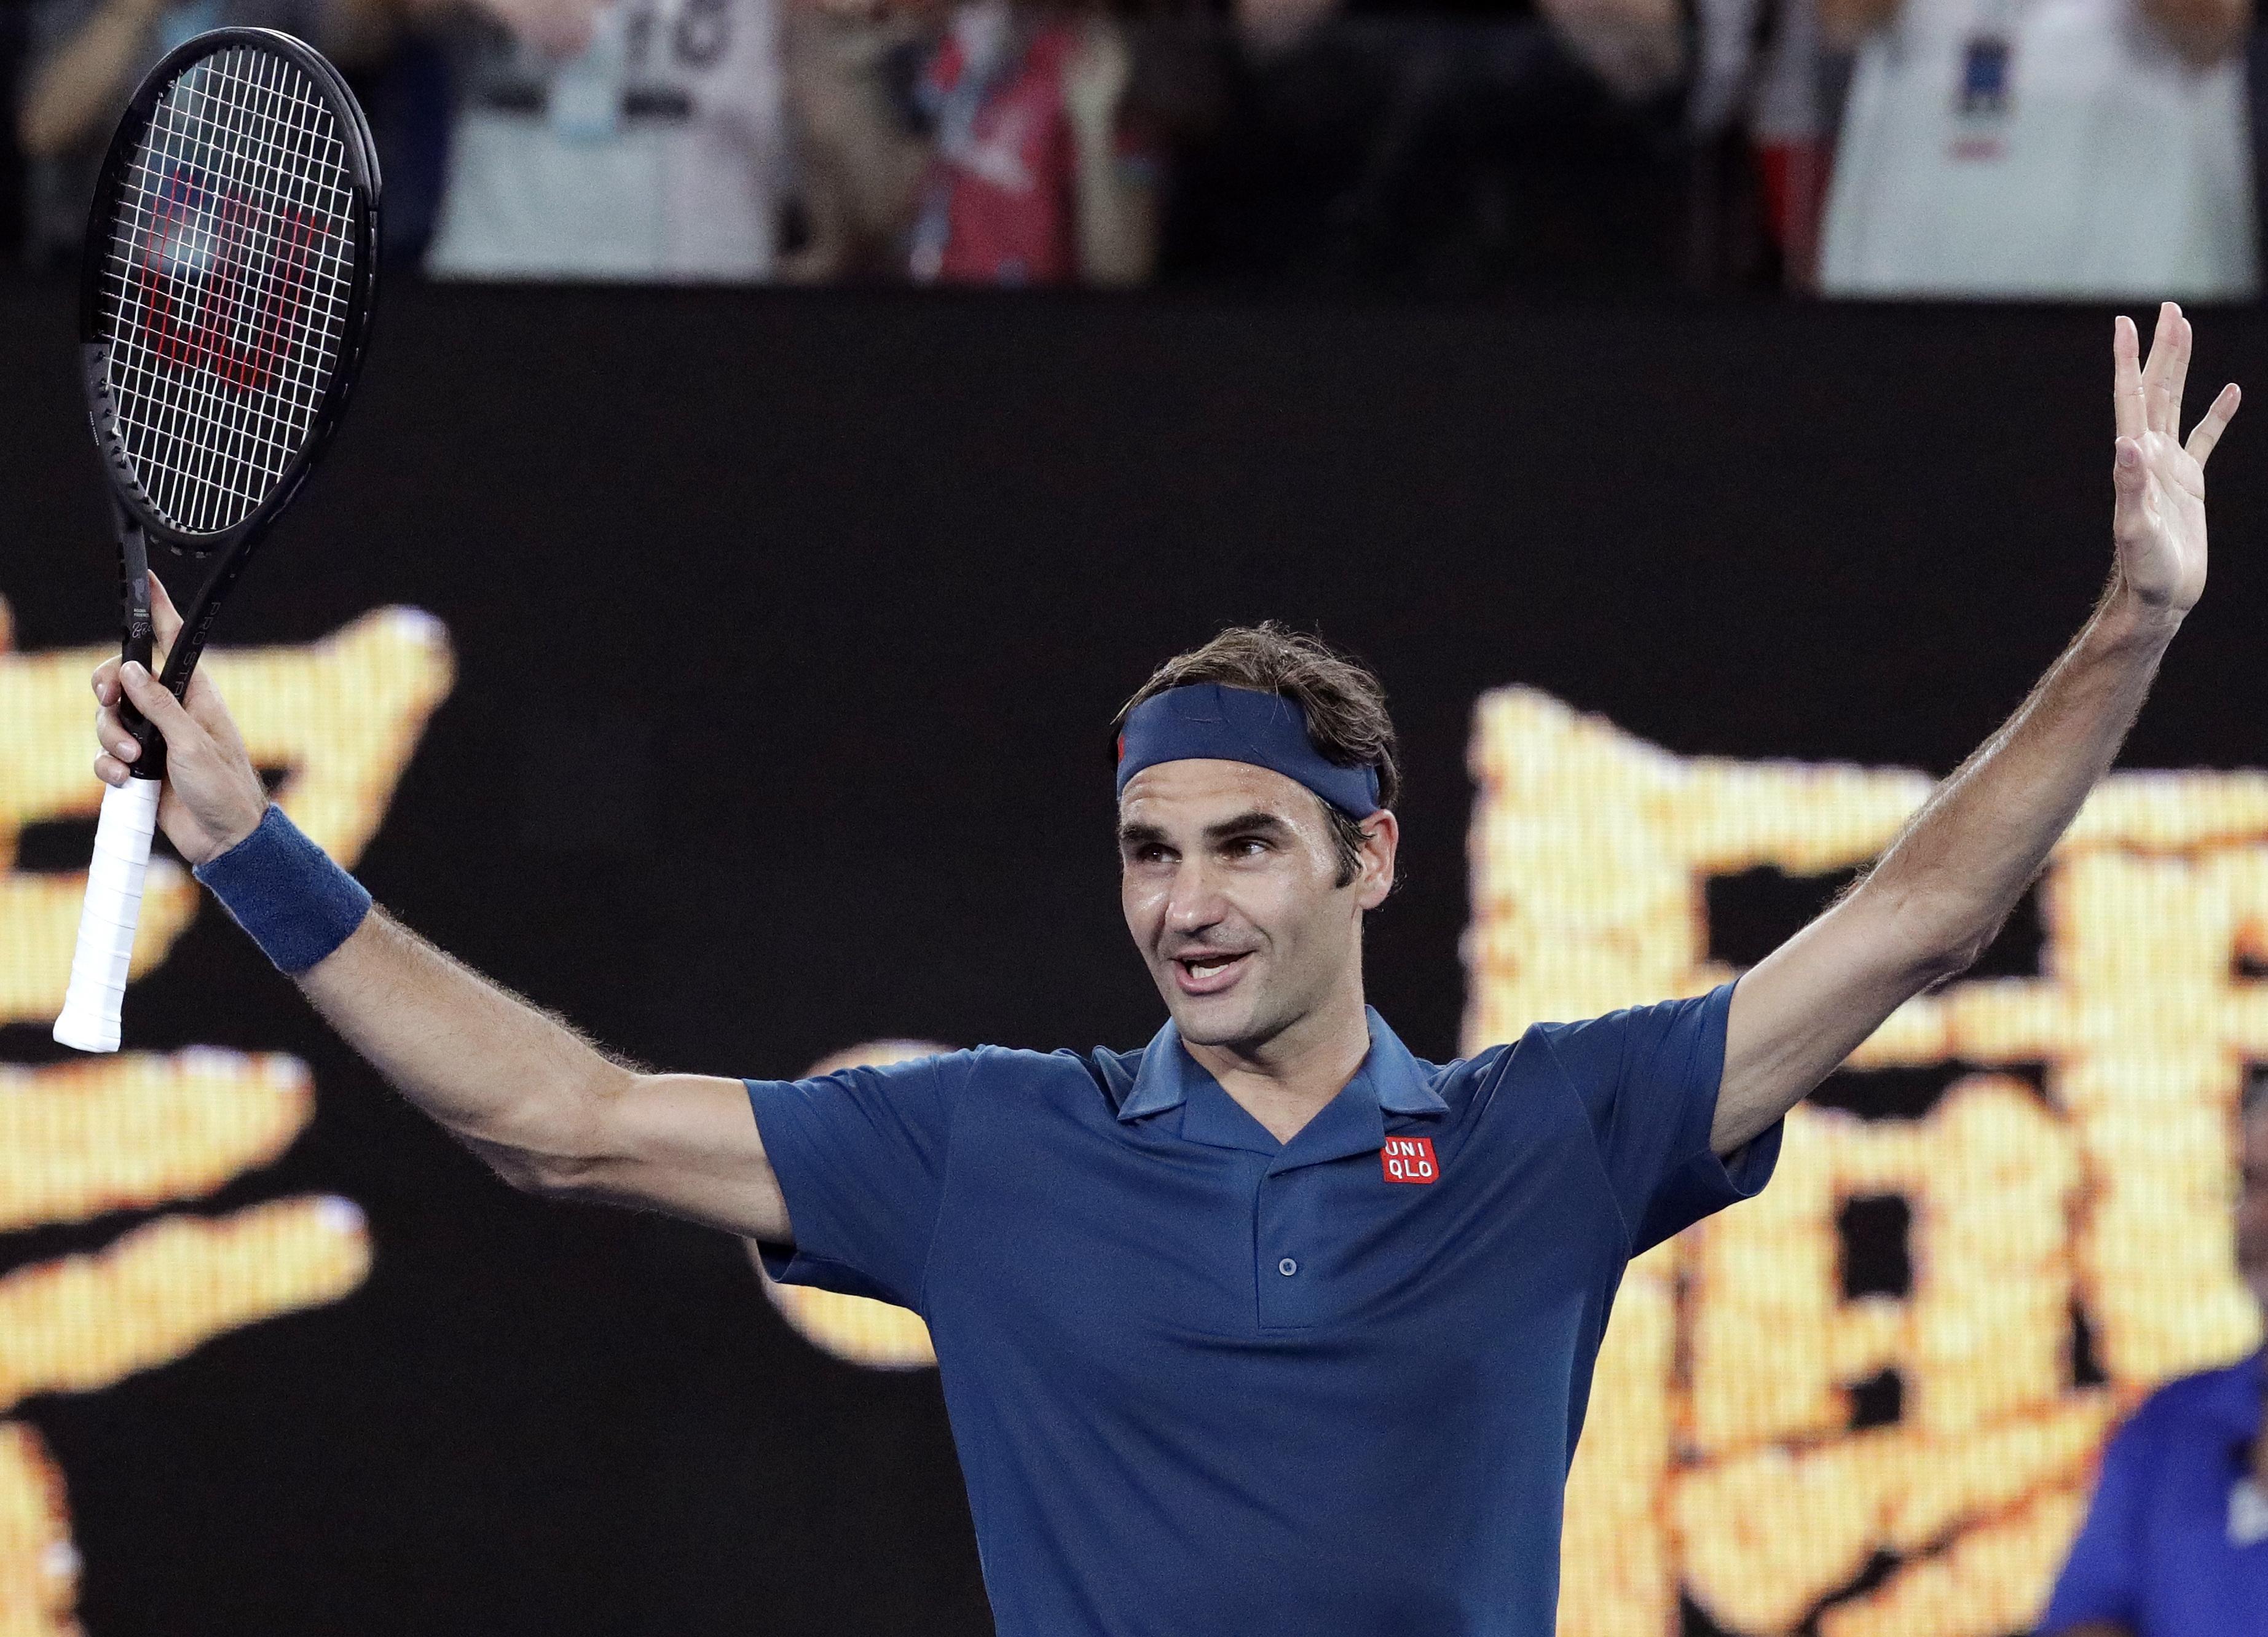 Federer through to 2nd round at Australian Open